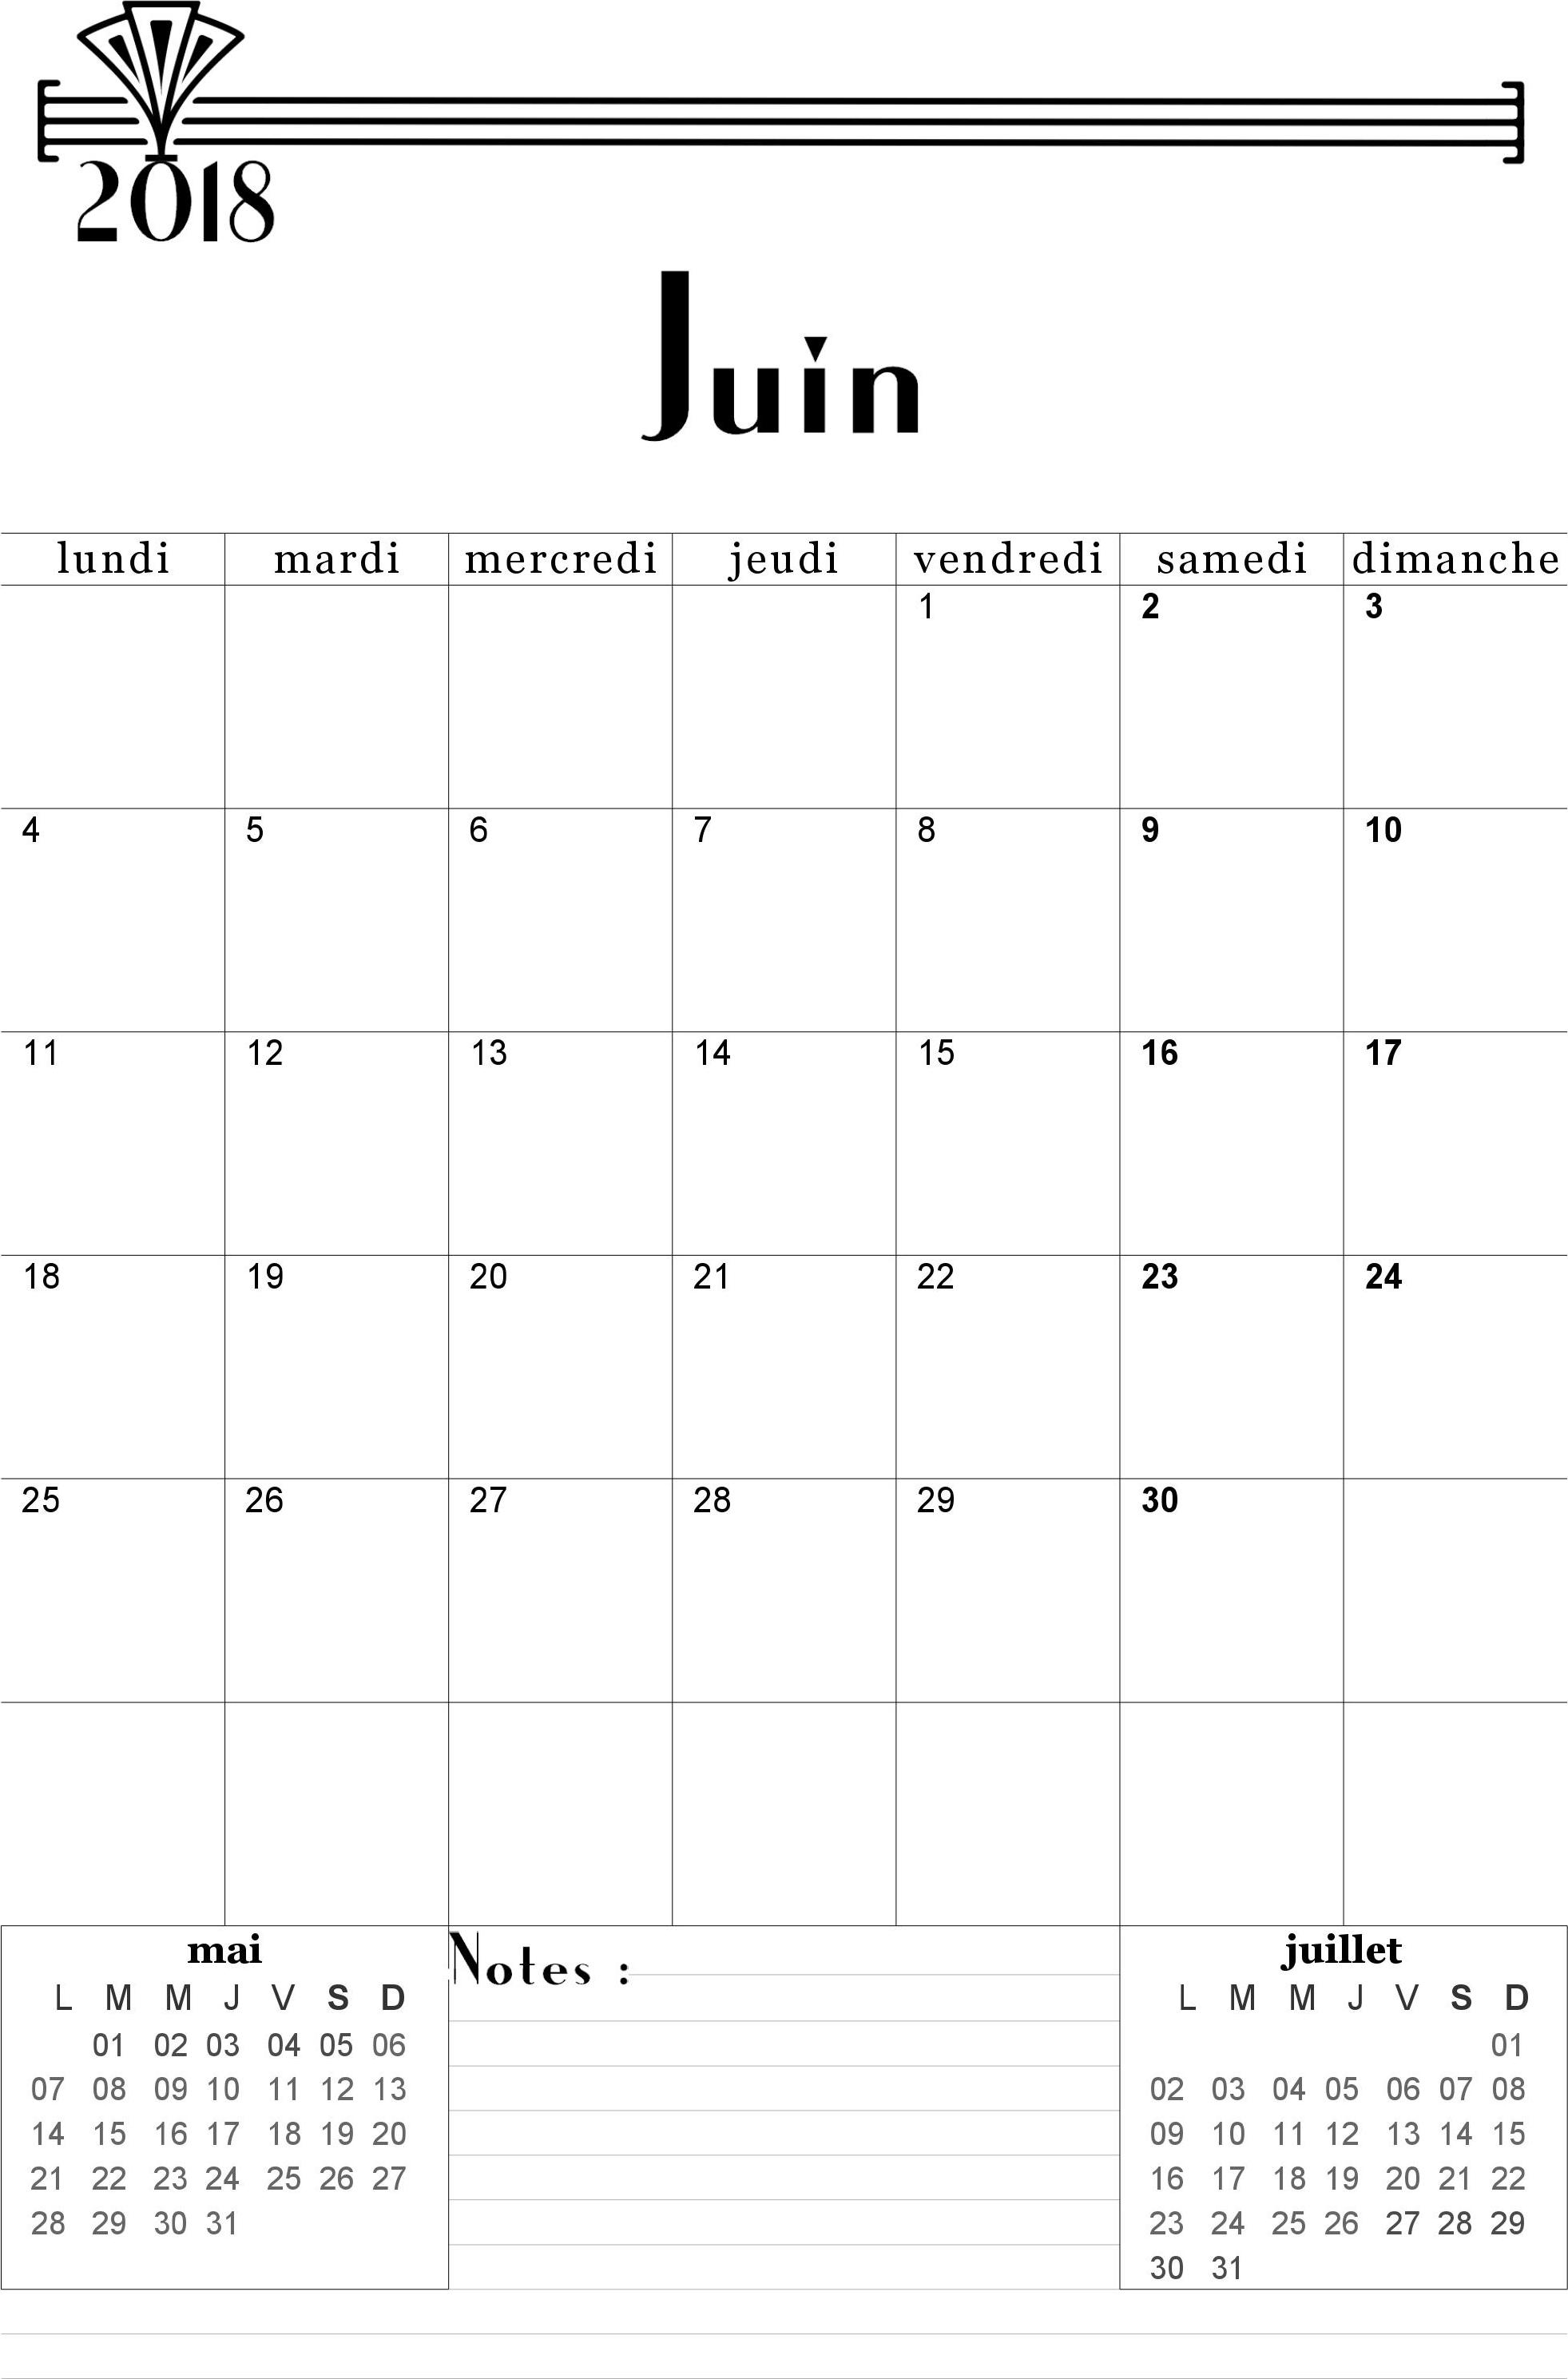 Calendrier 2017-2018 mensuel à imprimer gratuitement ...